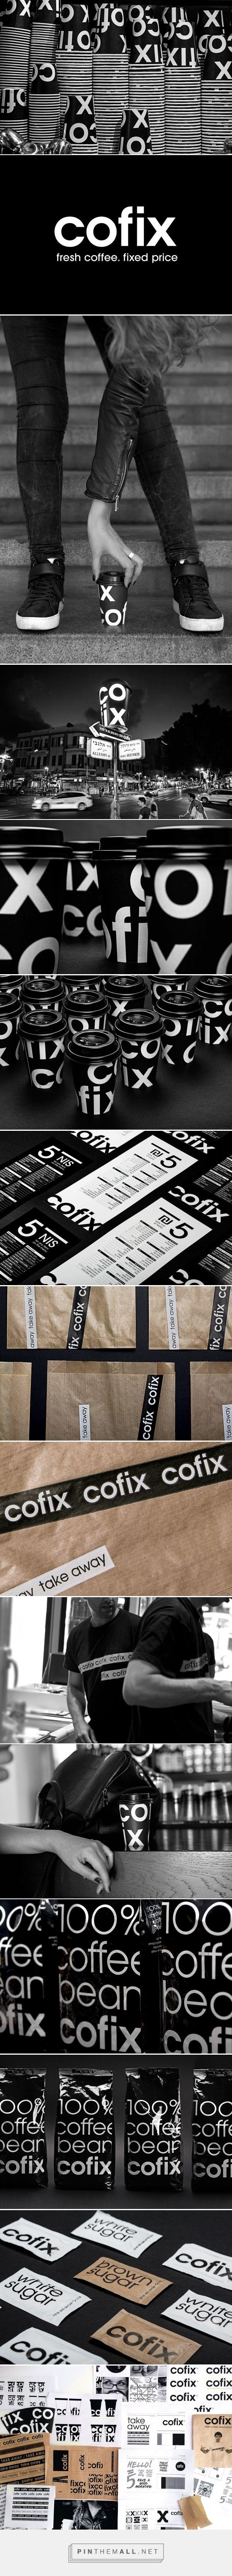 COFIX Coffee Shop Branding by Kapsoola   Fivestar Branding Agency – Design and Branding Agency & Curated Inspiration Gallery